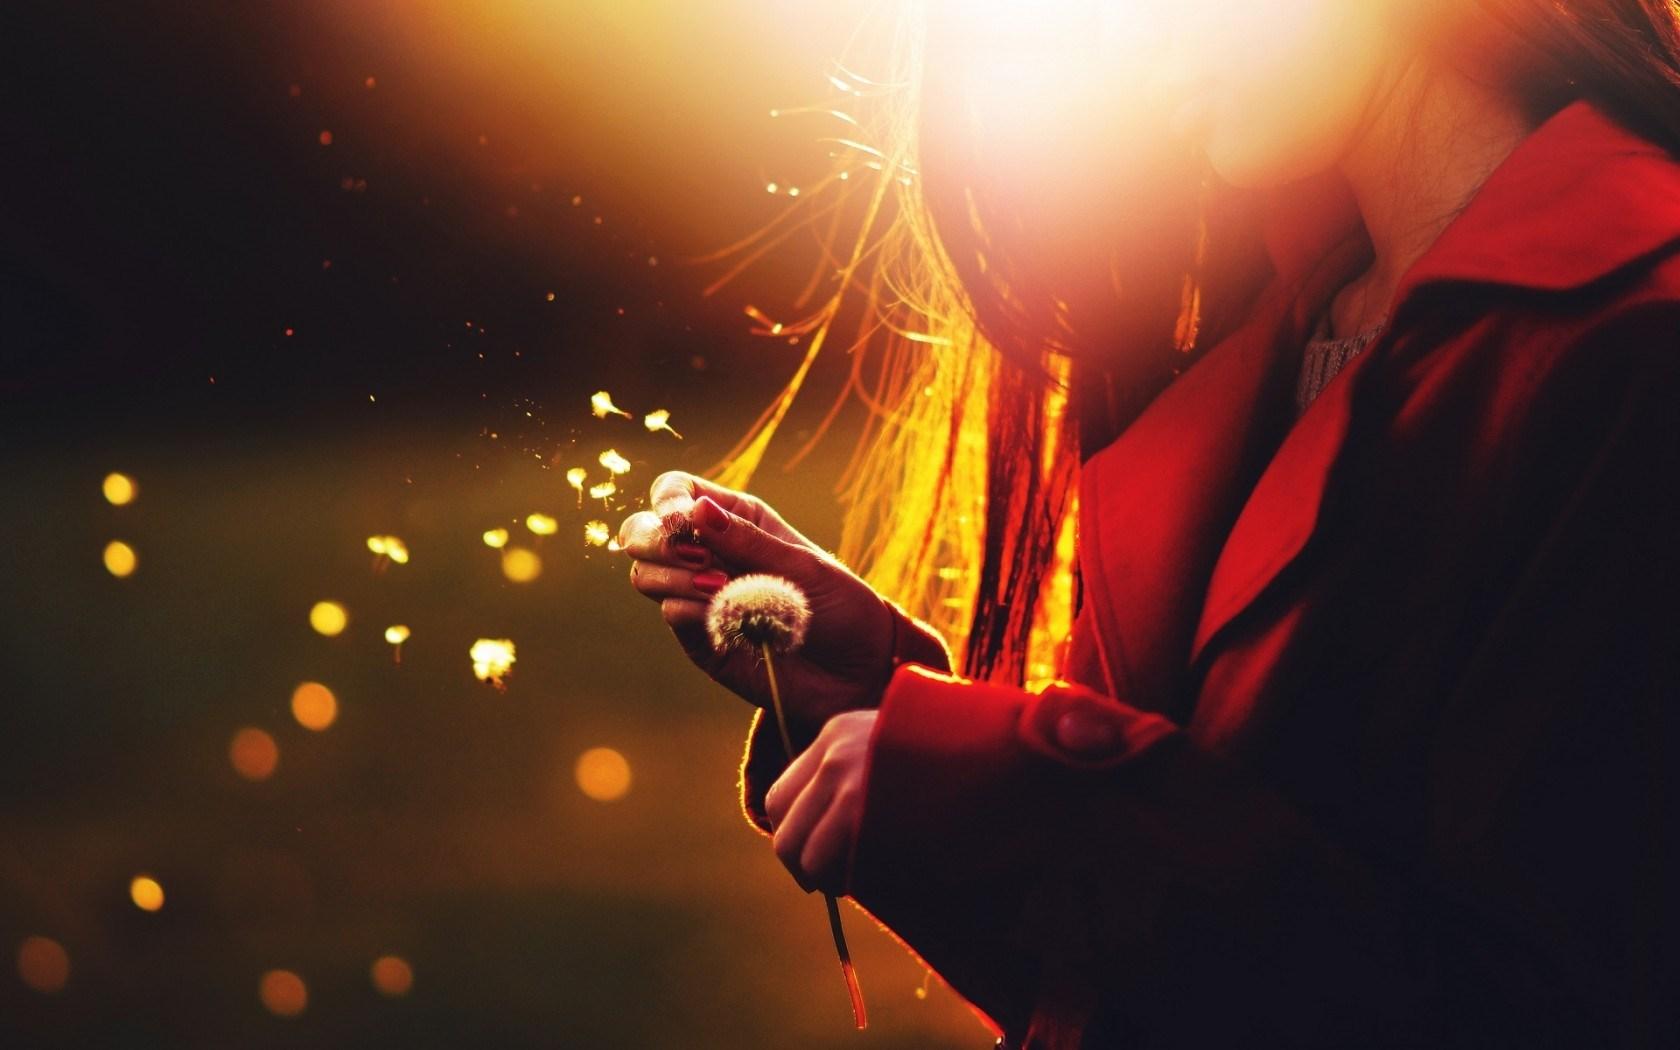 Mood Girl Dandelion Seeds Flower Sun